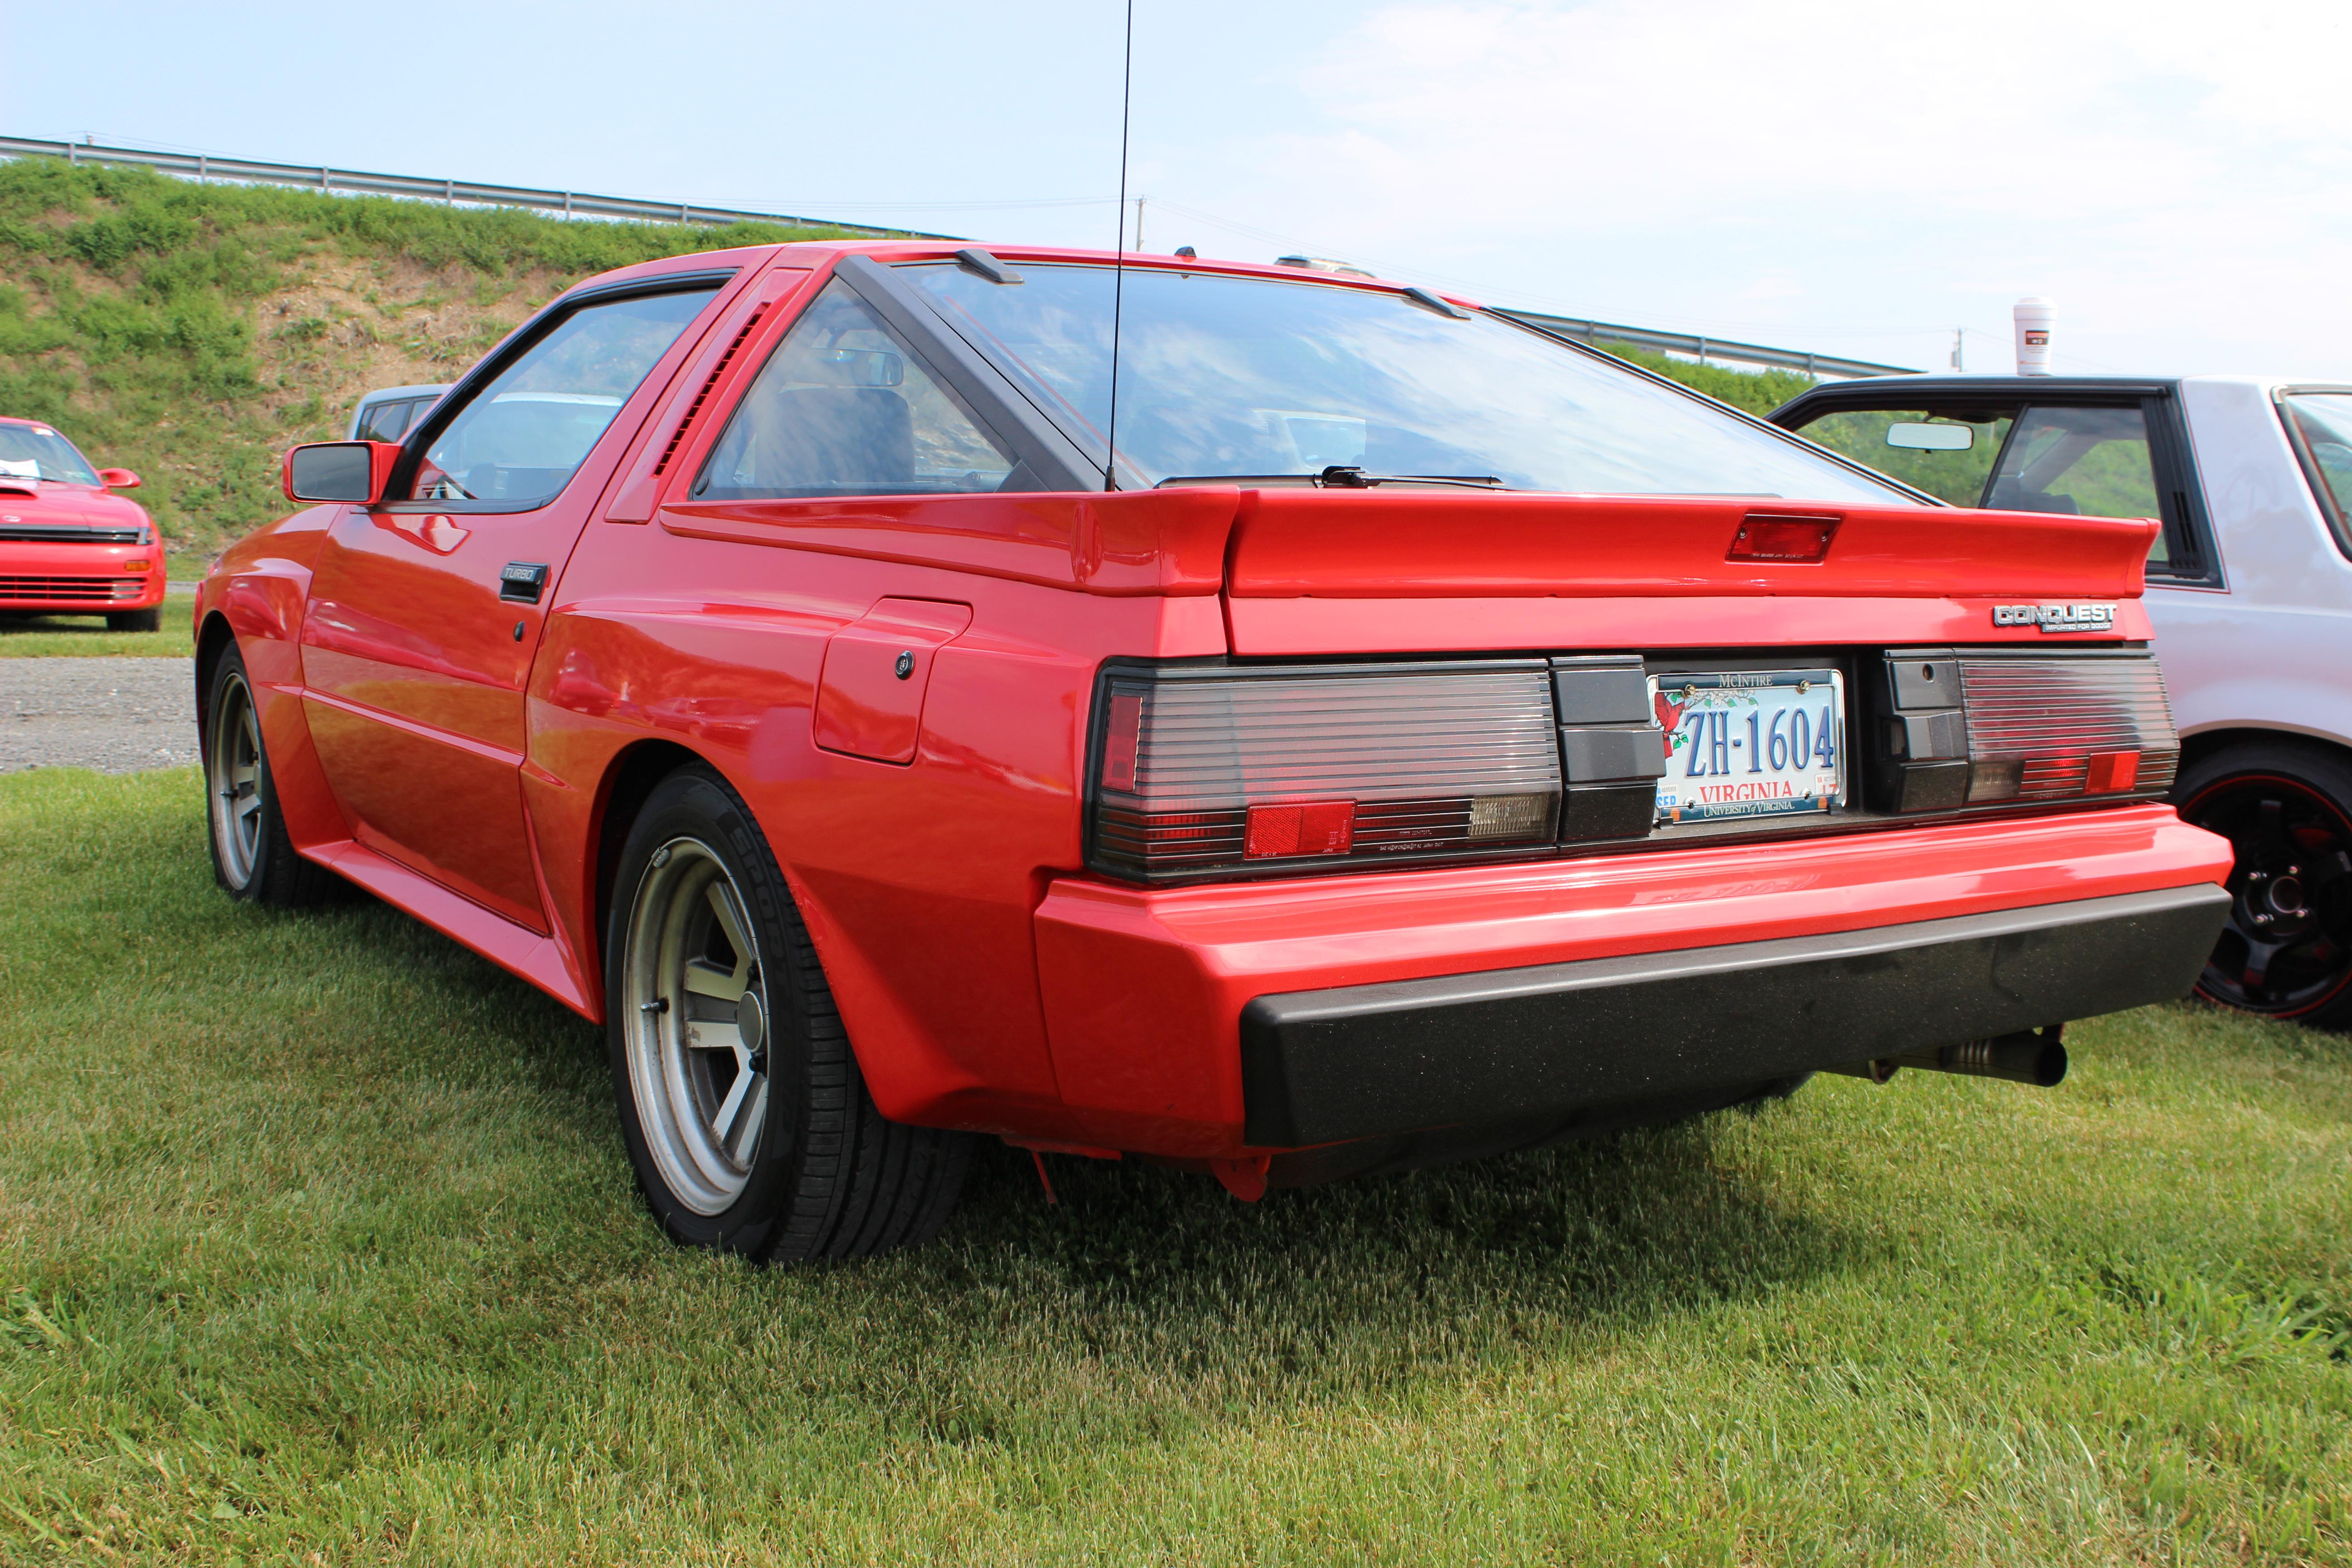 Filechrysler Conquest 17746147802 Wikimedia Commons Mitsubishi Starion Dodge